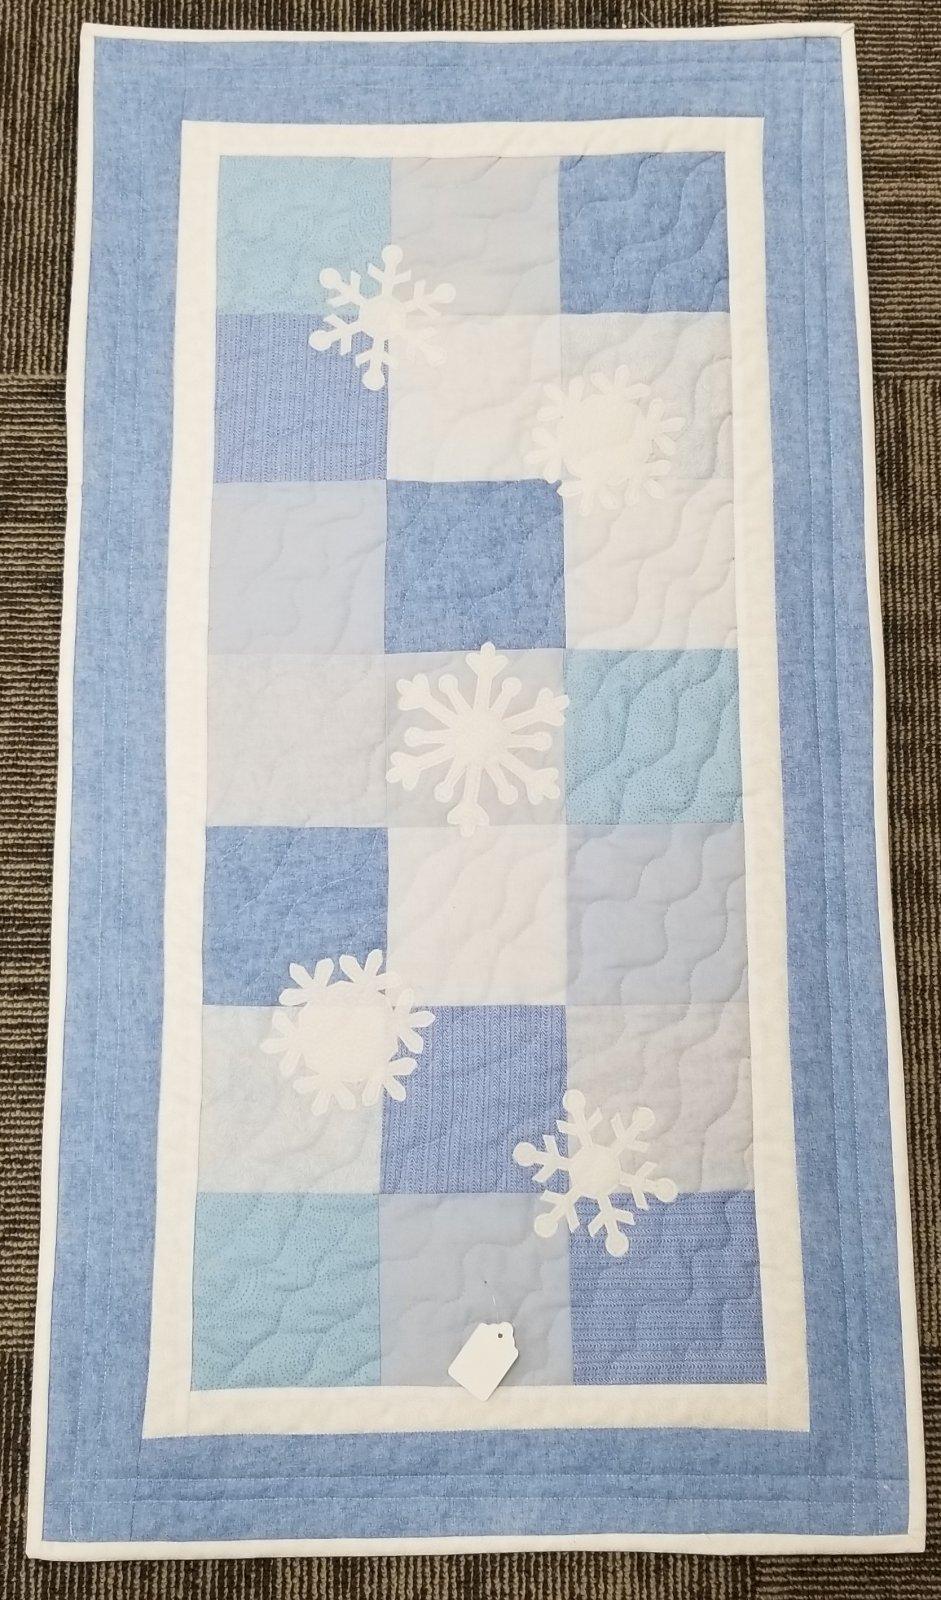 FlowerPower/Snowflake Table Runner 20.5 X 38